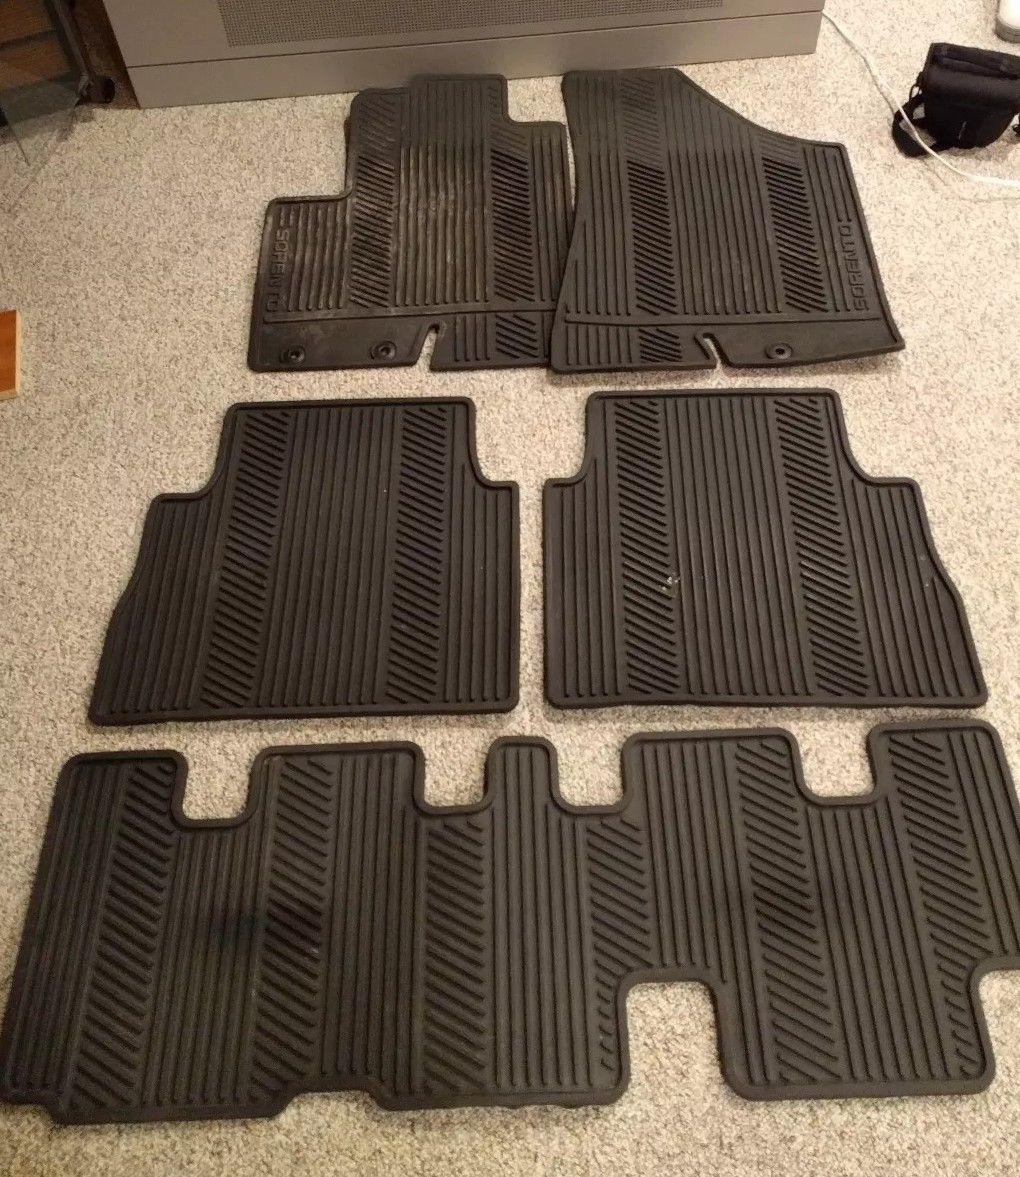 2011 2012 2013 Kia Sorento all weather mats 3 row 5 piece OEM Free shipping-floor-mats.jpg